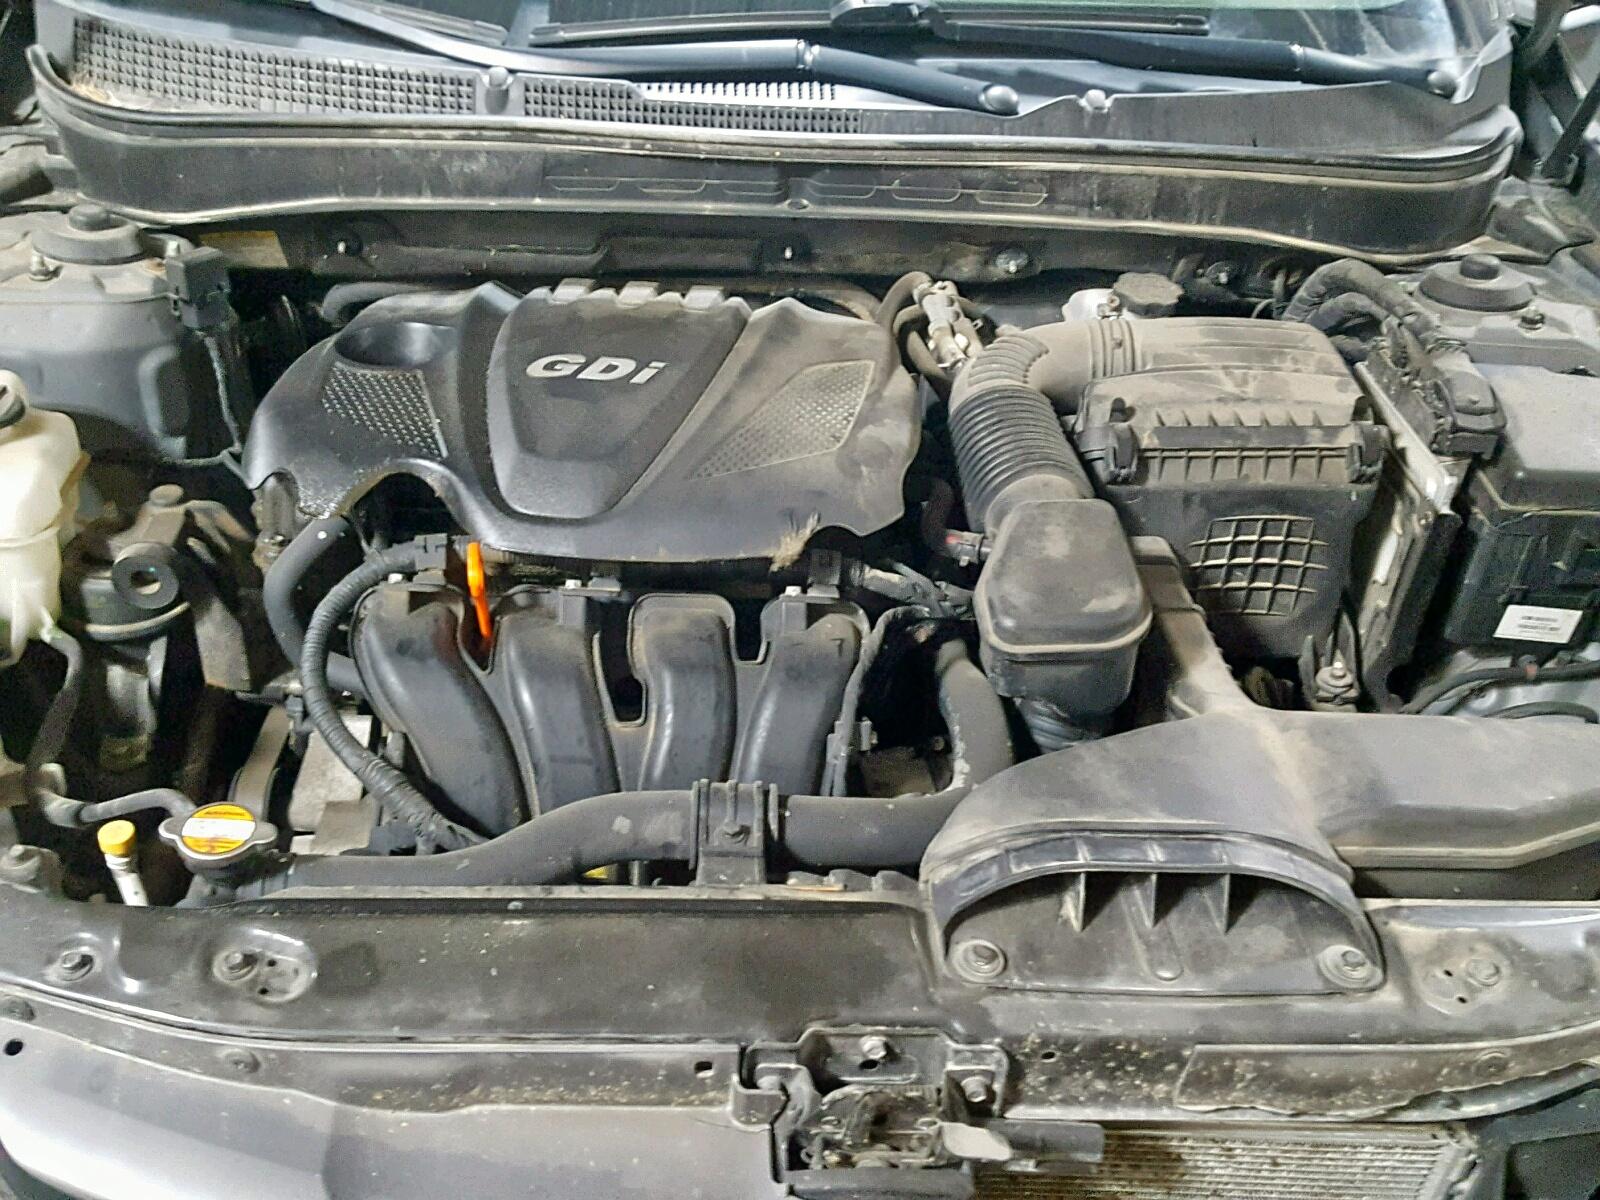 2013 Hyundai Sonata Gls 2.4L inside view